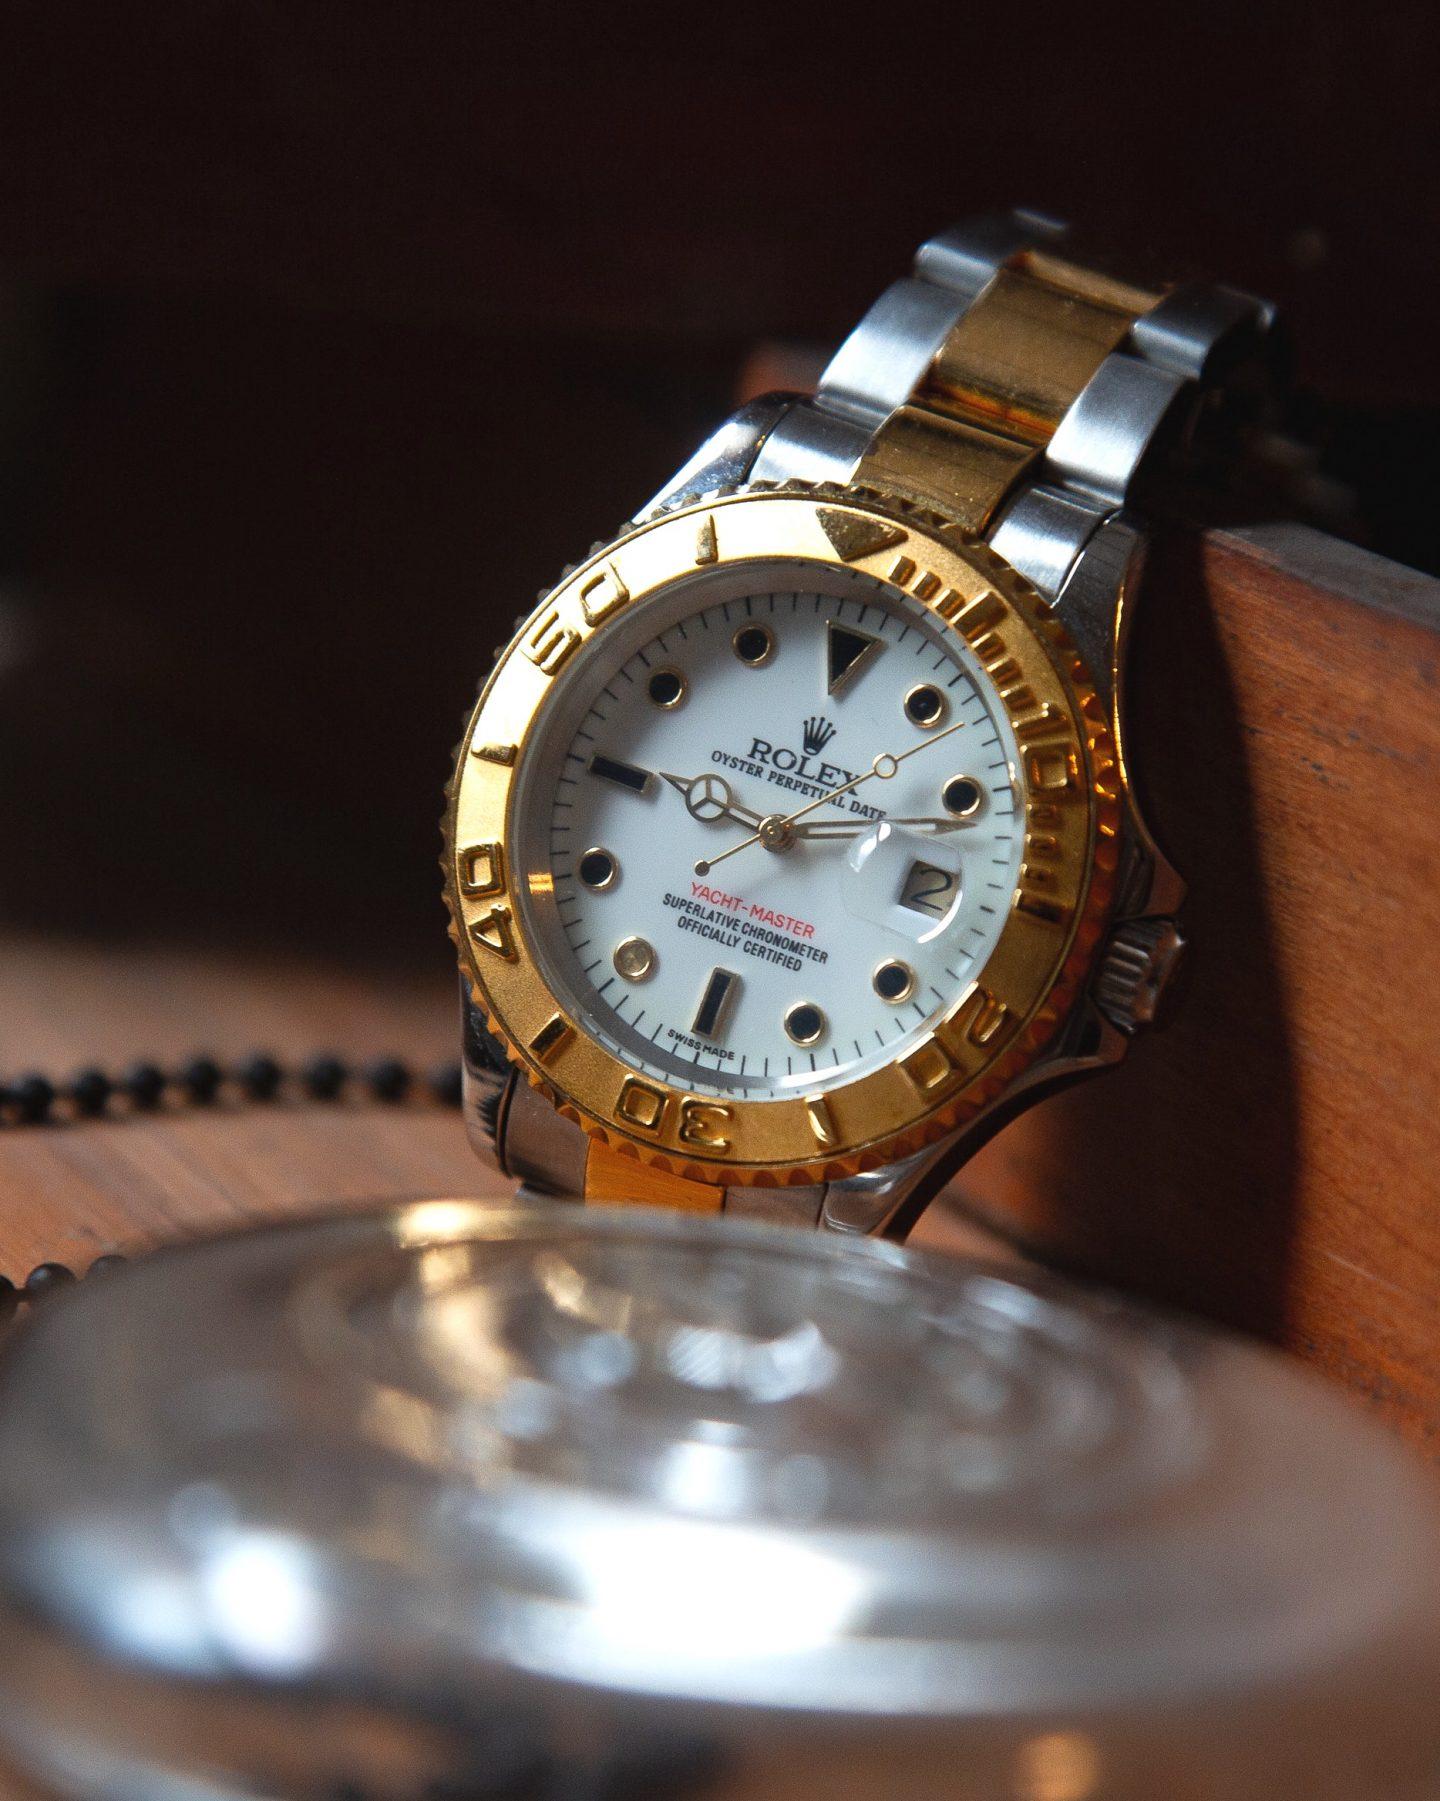 Best entry level luxury watches for women: Rolex Datejust